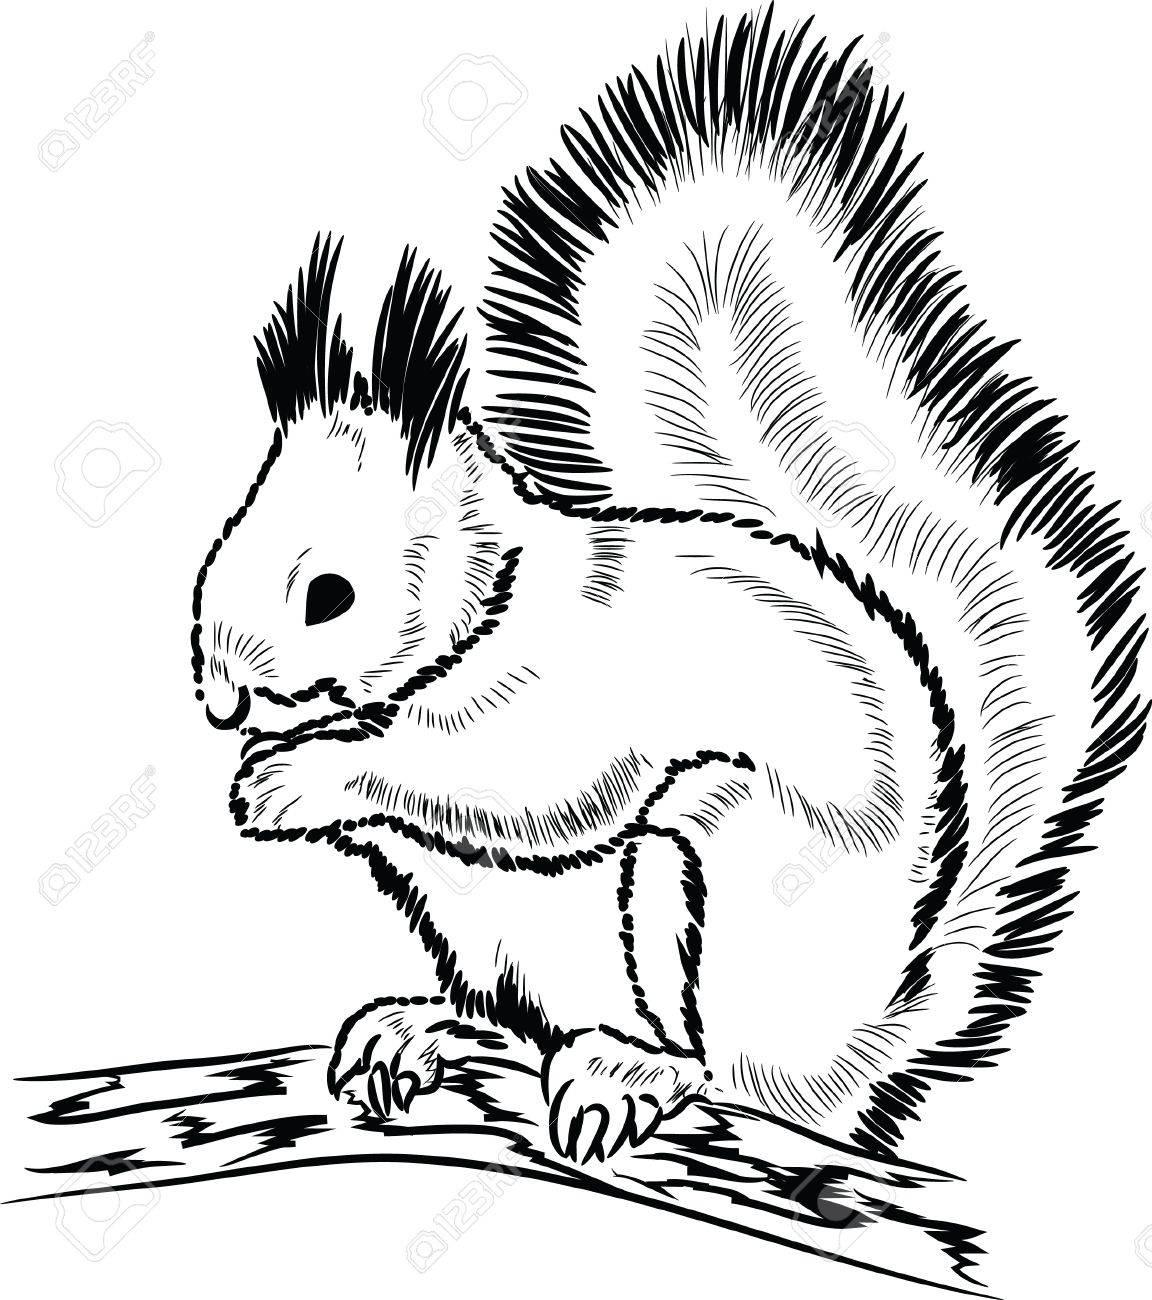 Squirrel Pencil Drawing At Getdrawings